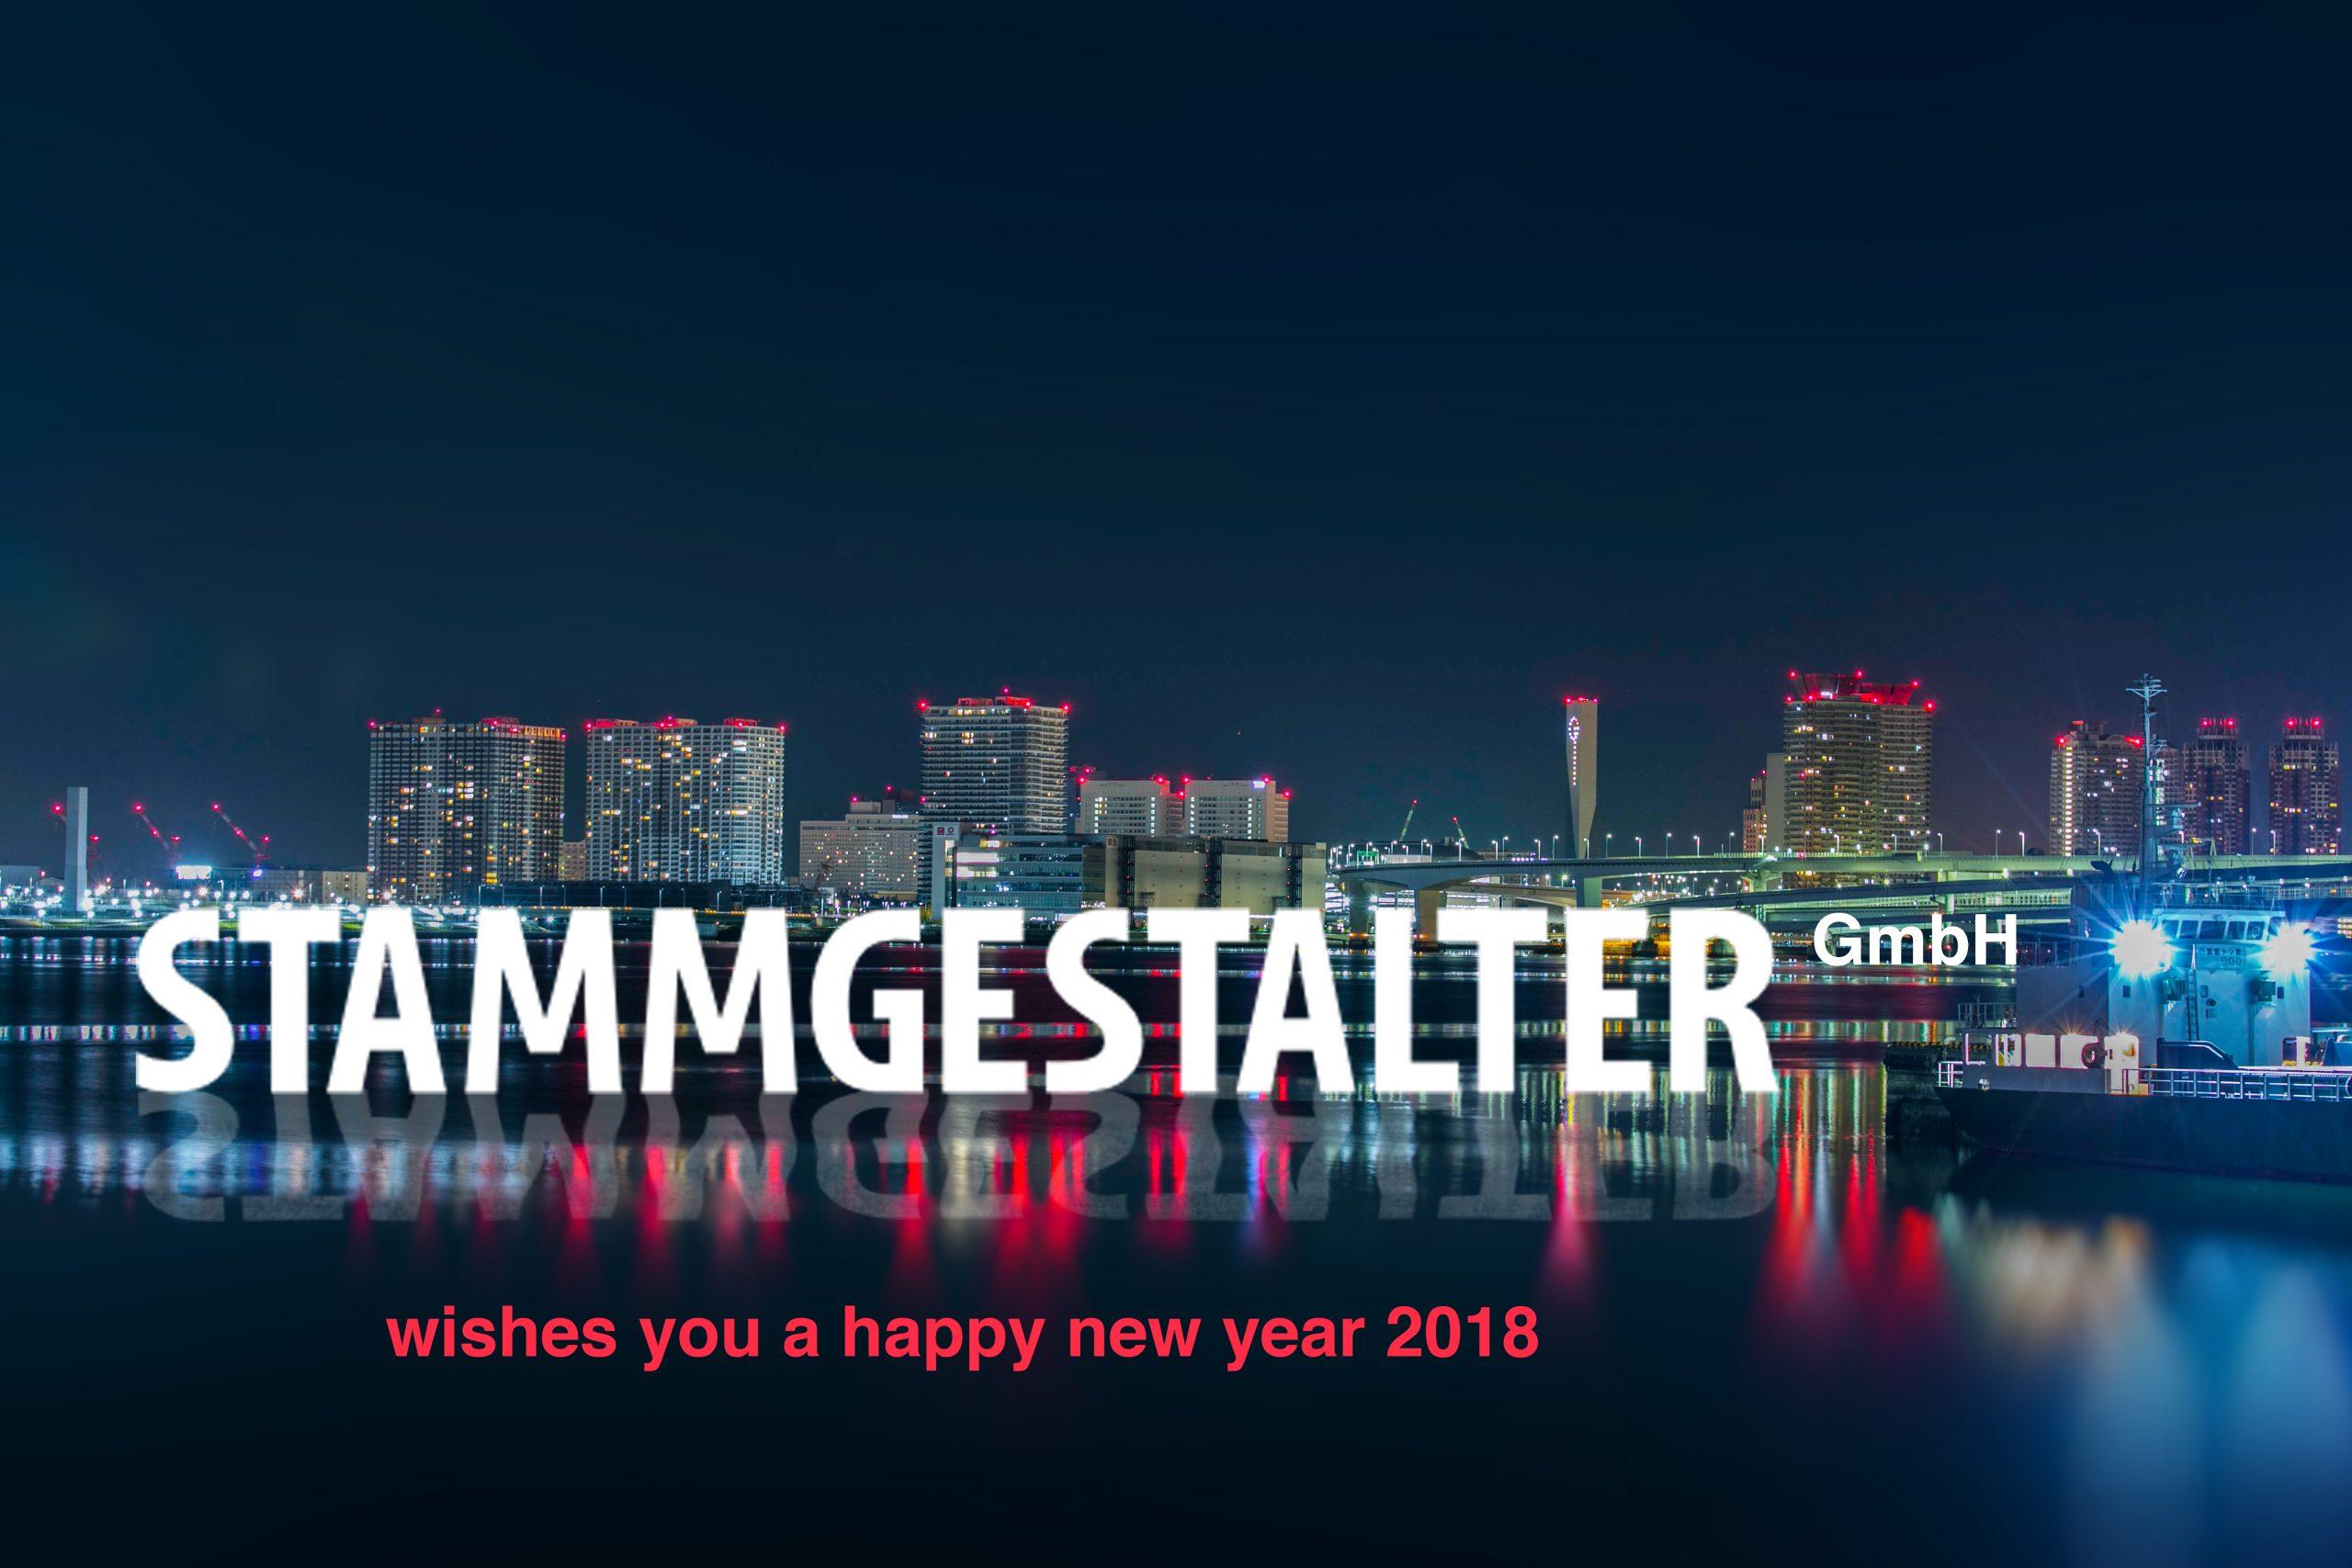 Stammgestalter_new_years_wishes2018